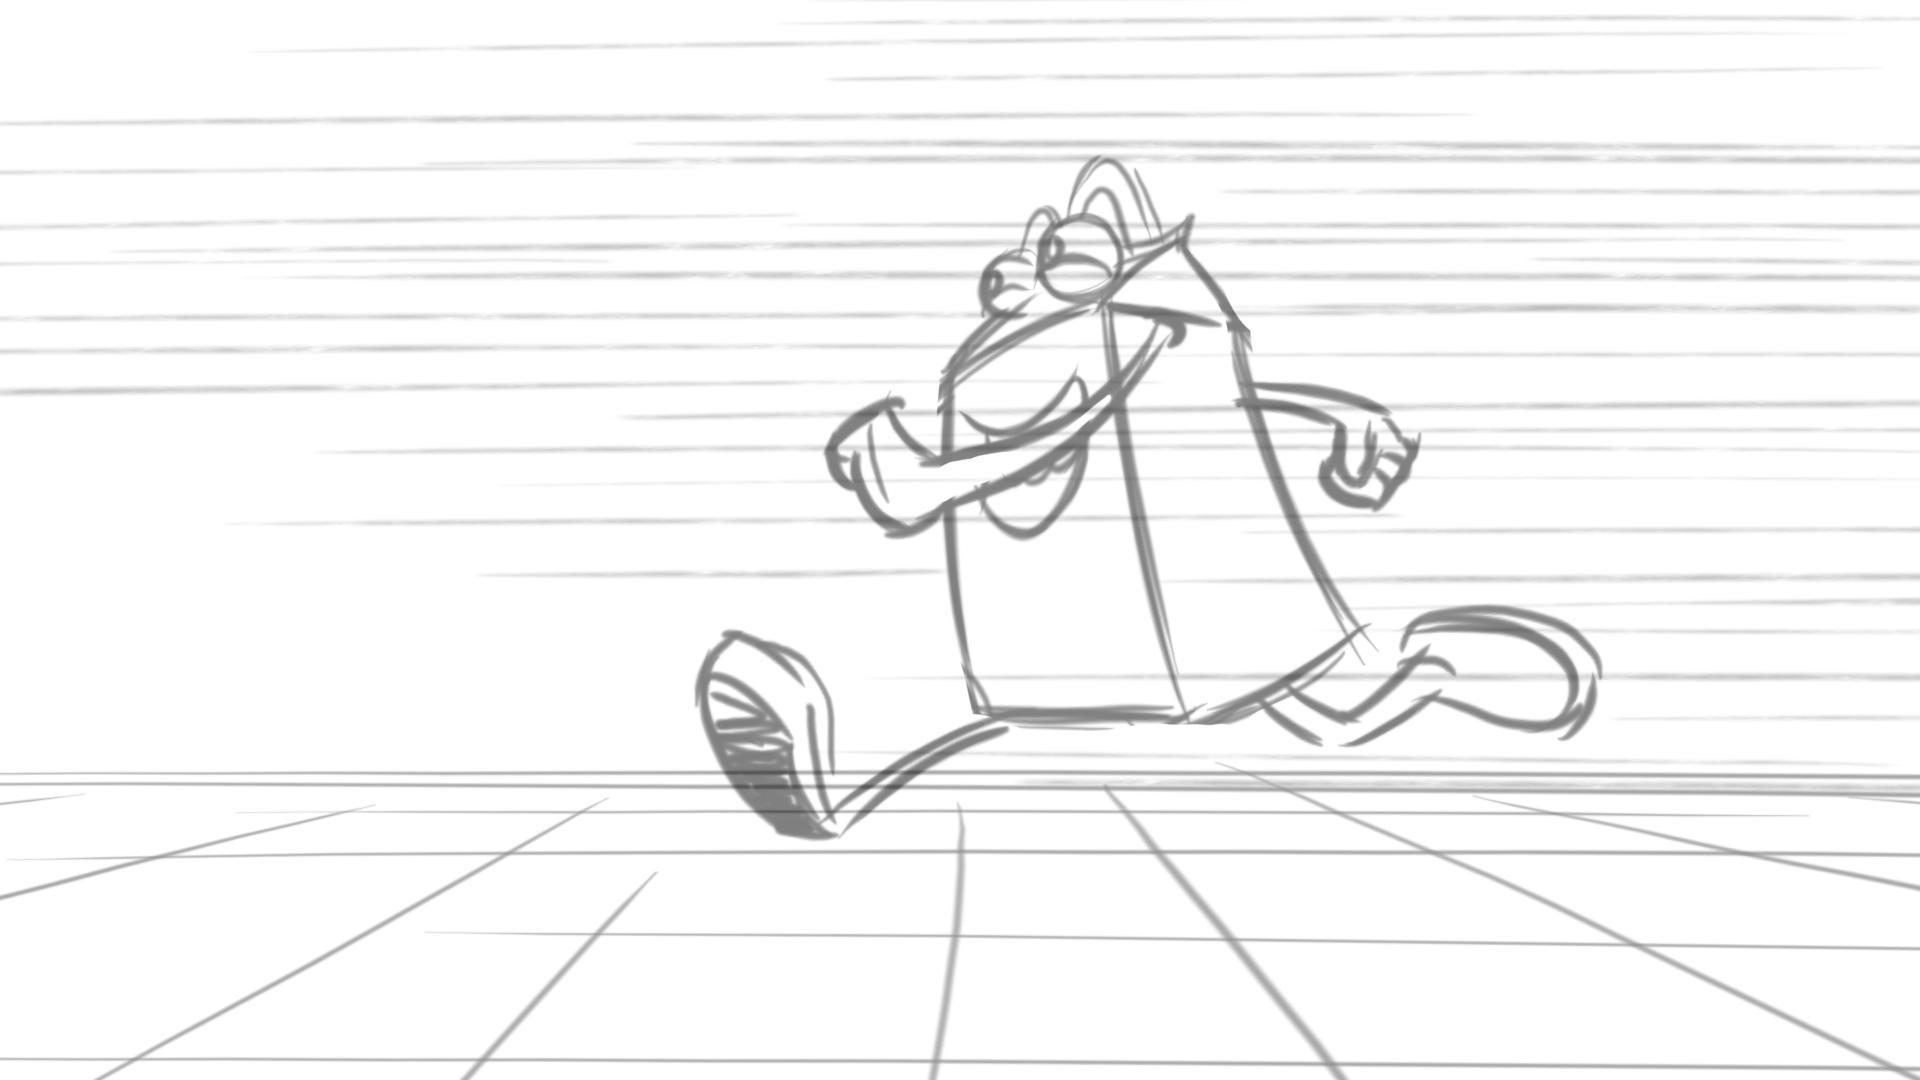 Mario-07-02.jpg